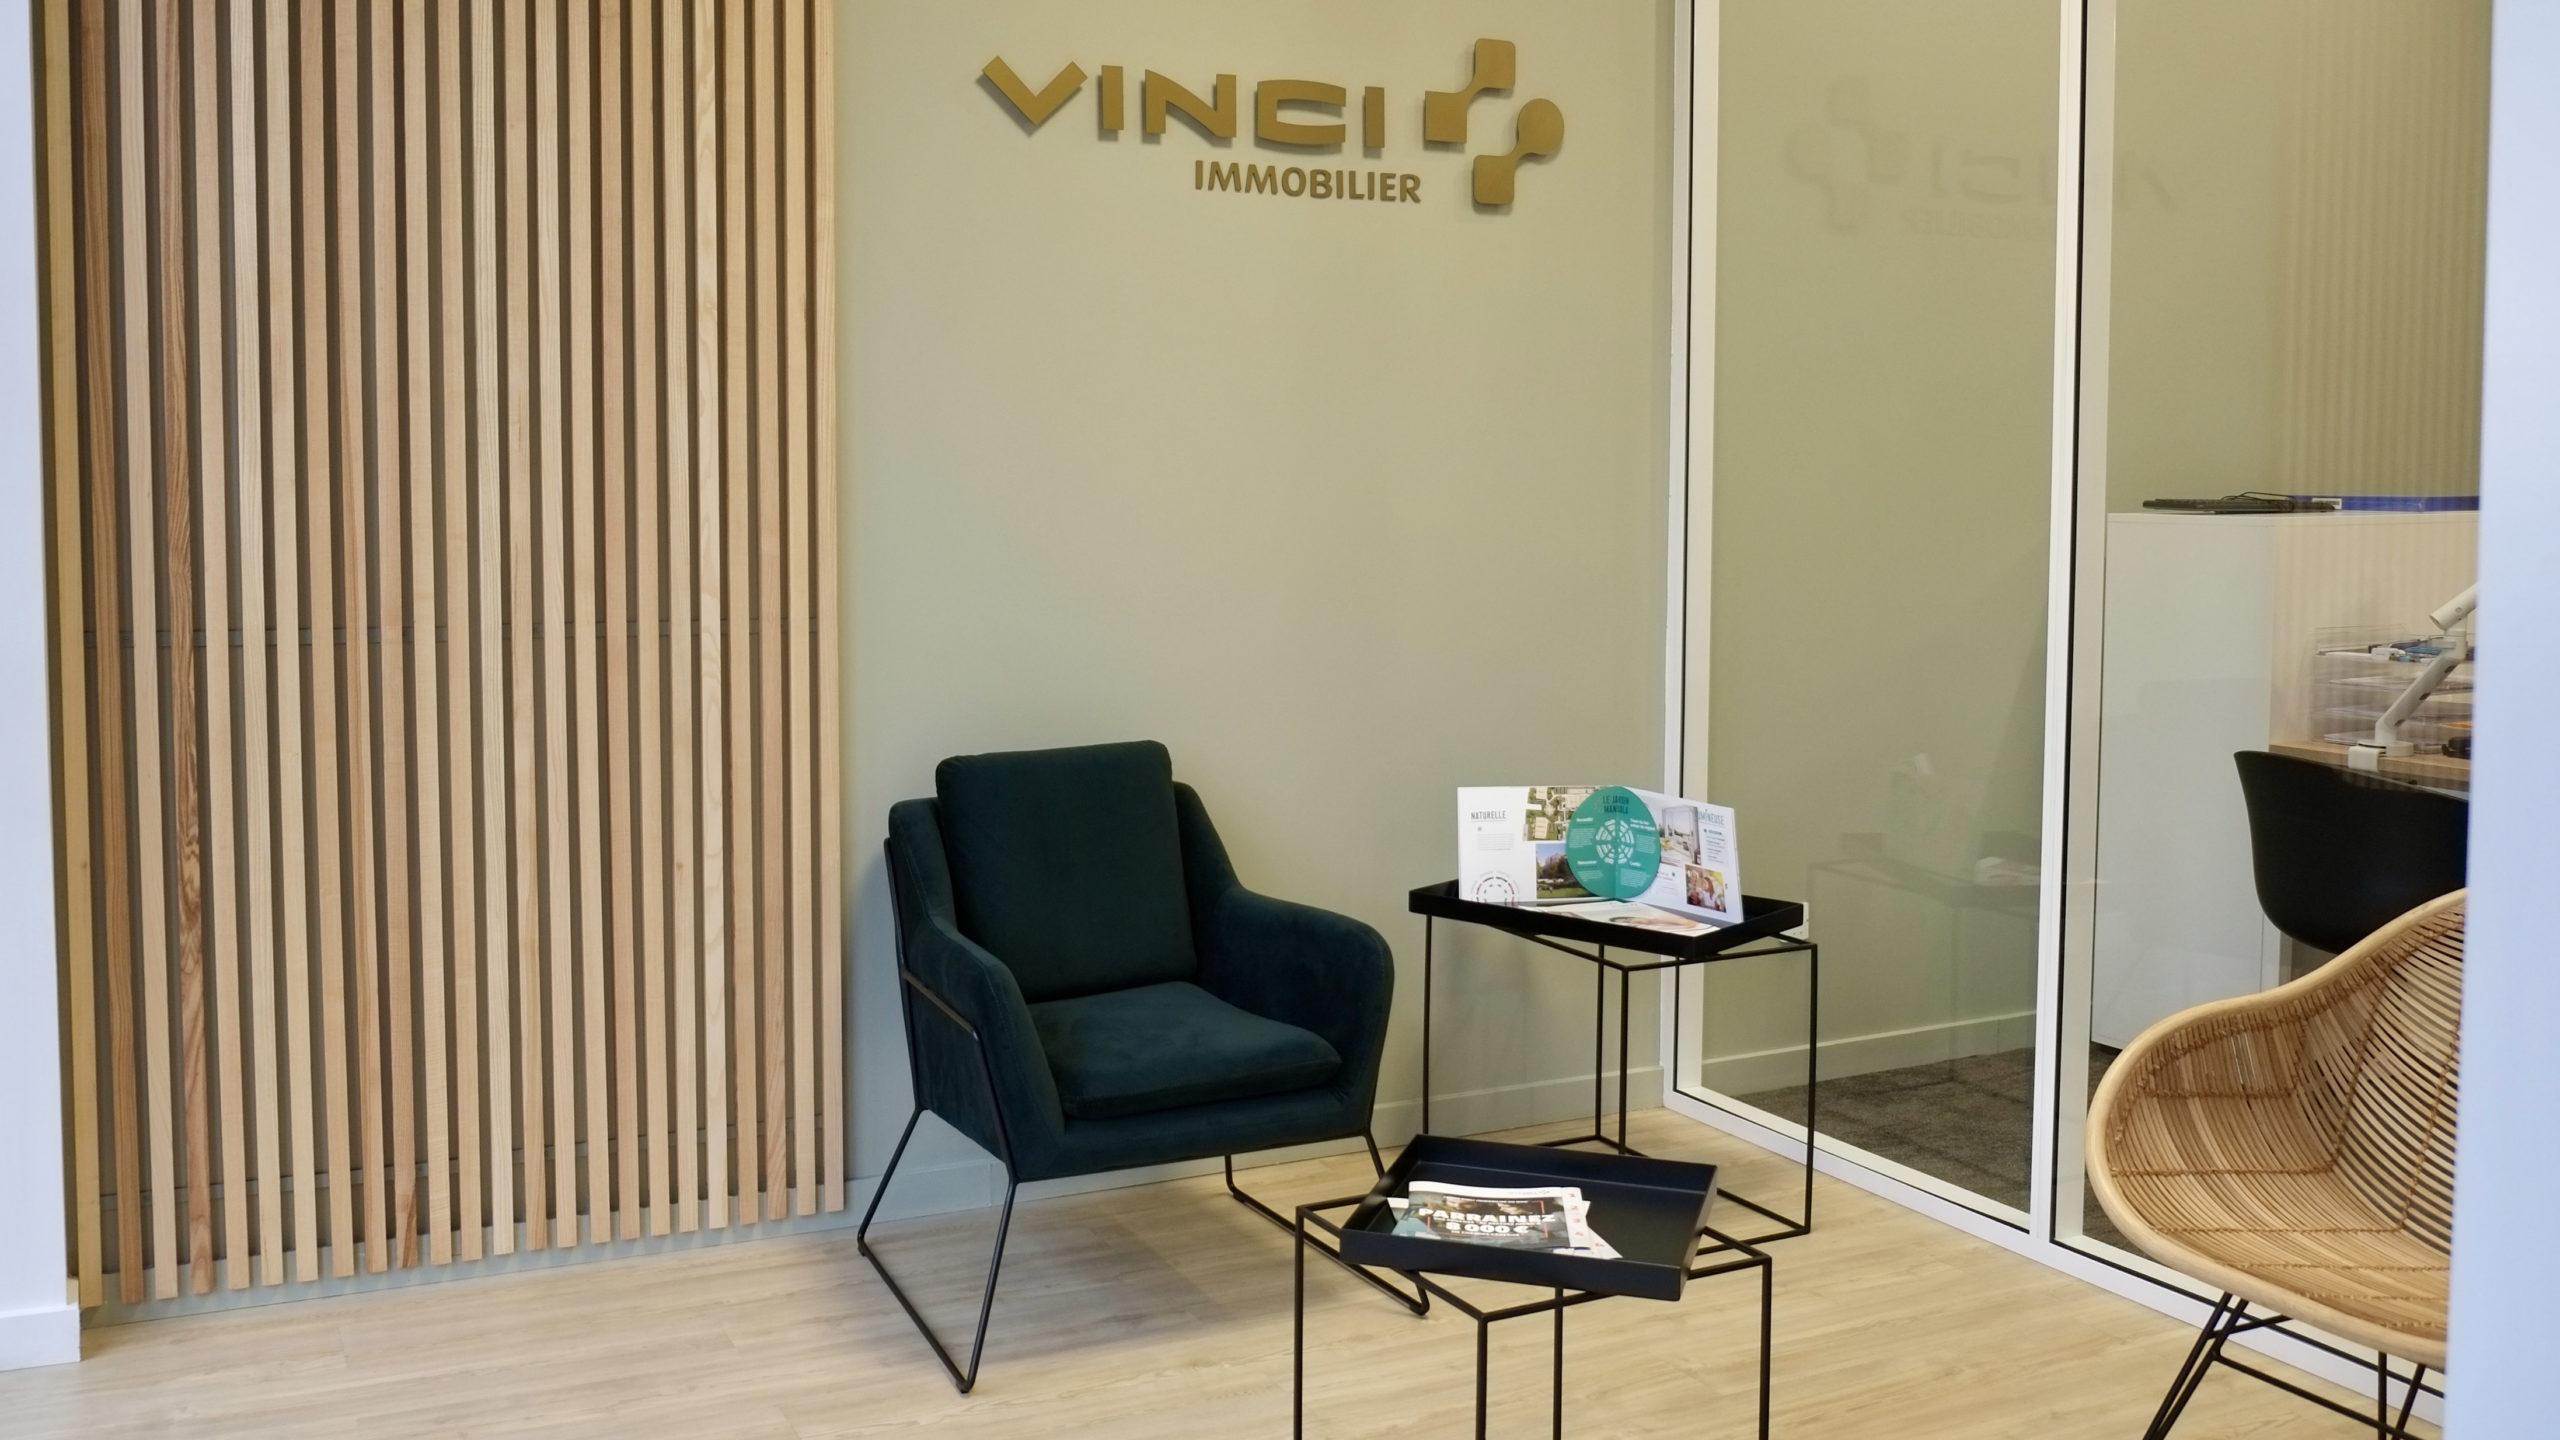 Agence Vinci Immobilier Rennes